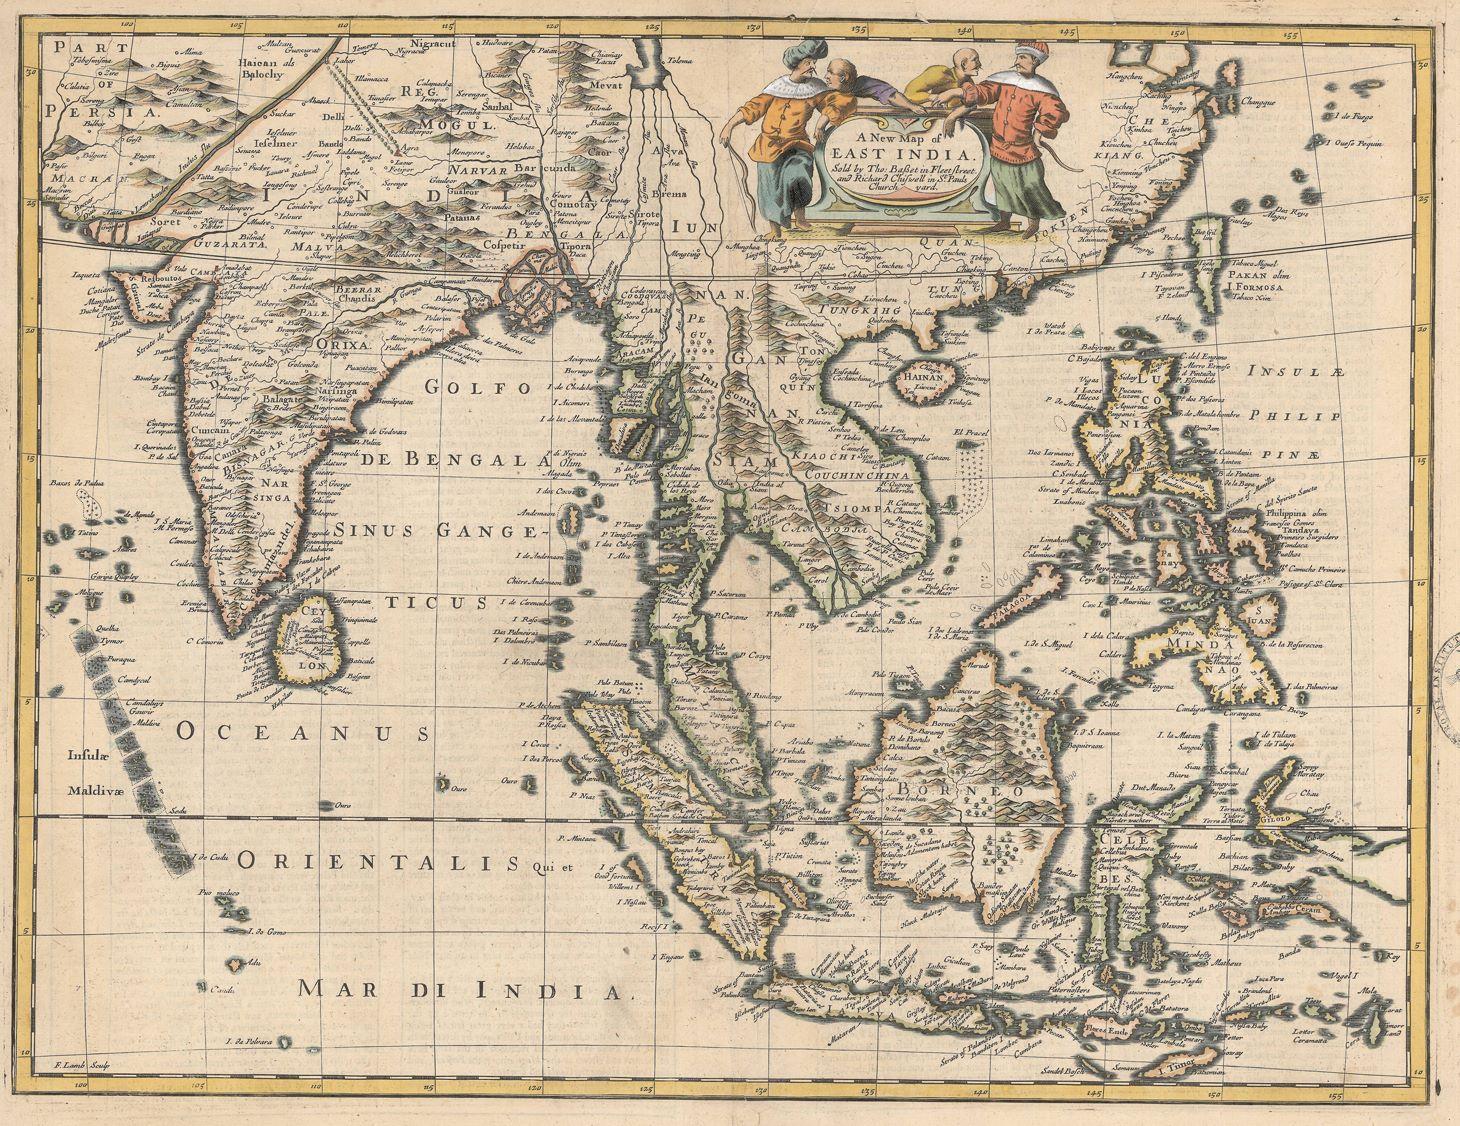 Antique Map East Indies By Speed 1676 Bartele Gallerybartele Gallery